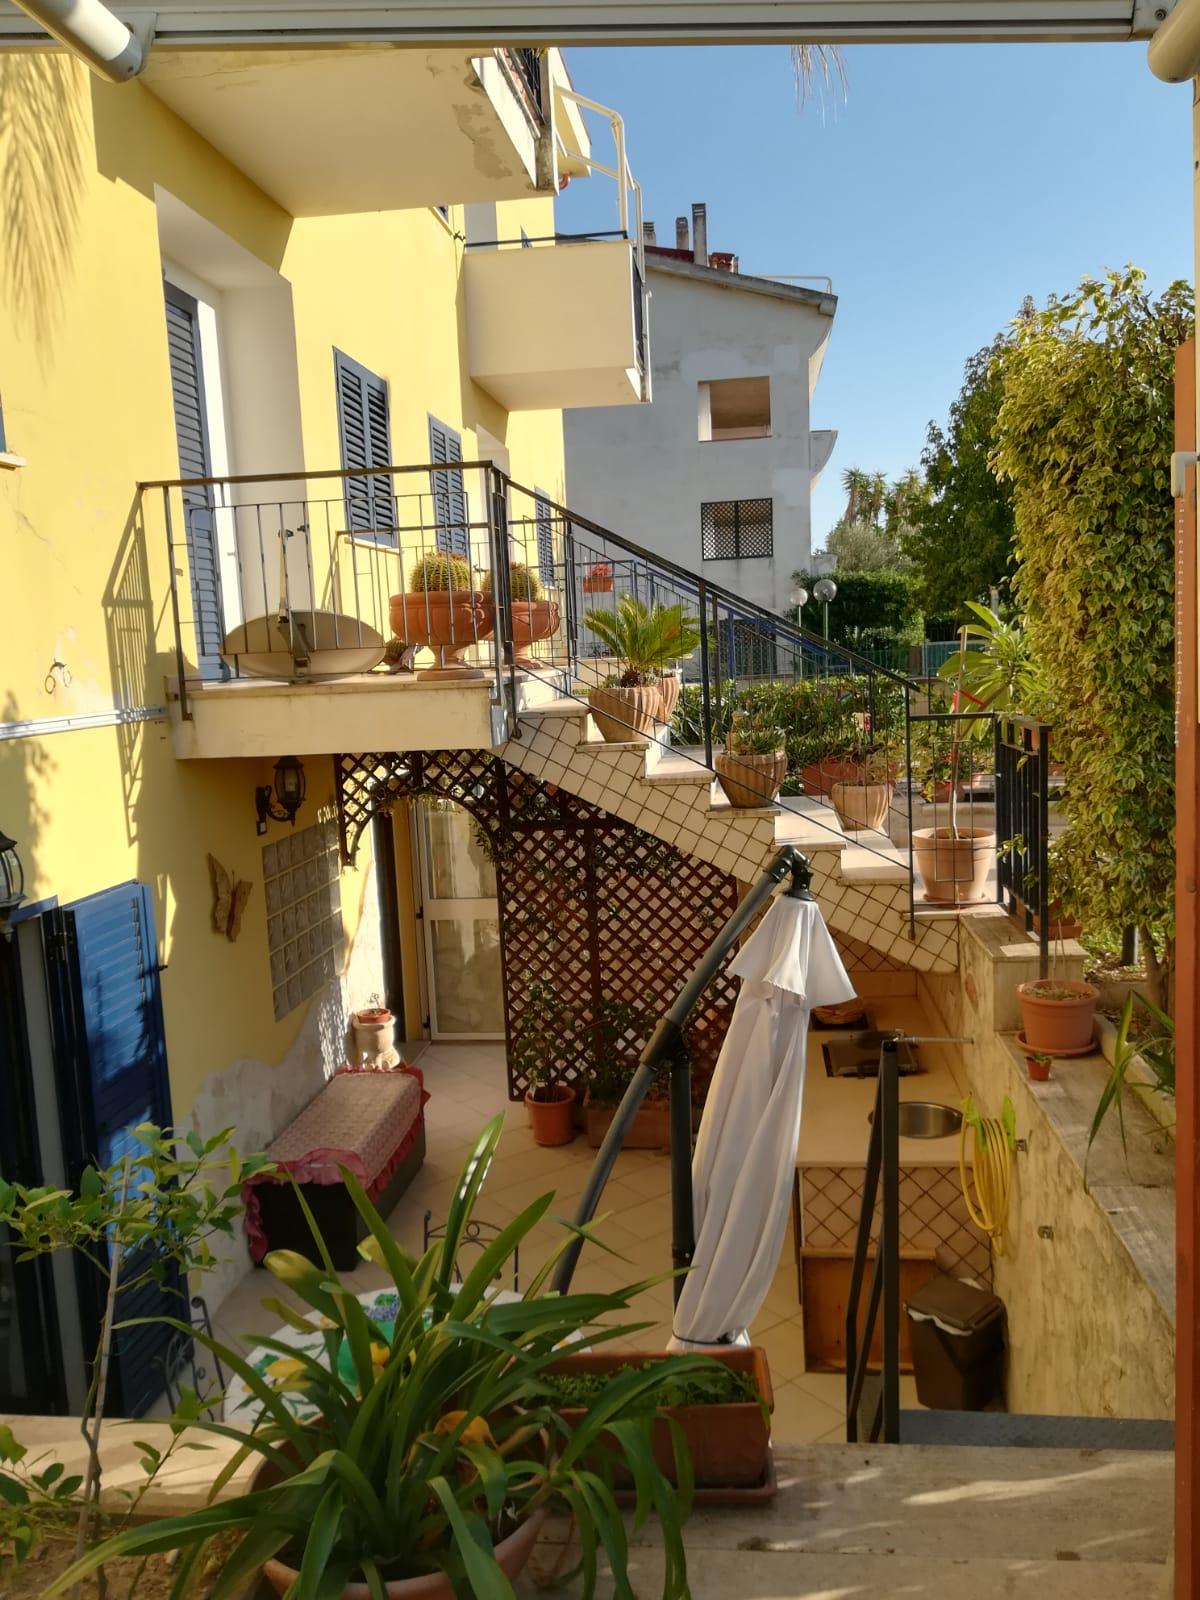 House villa 180 sq m